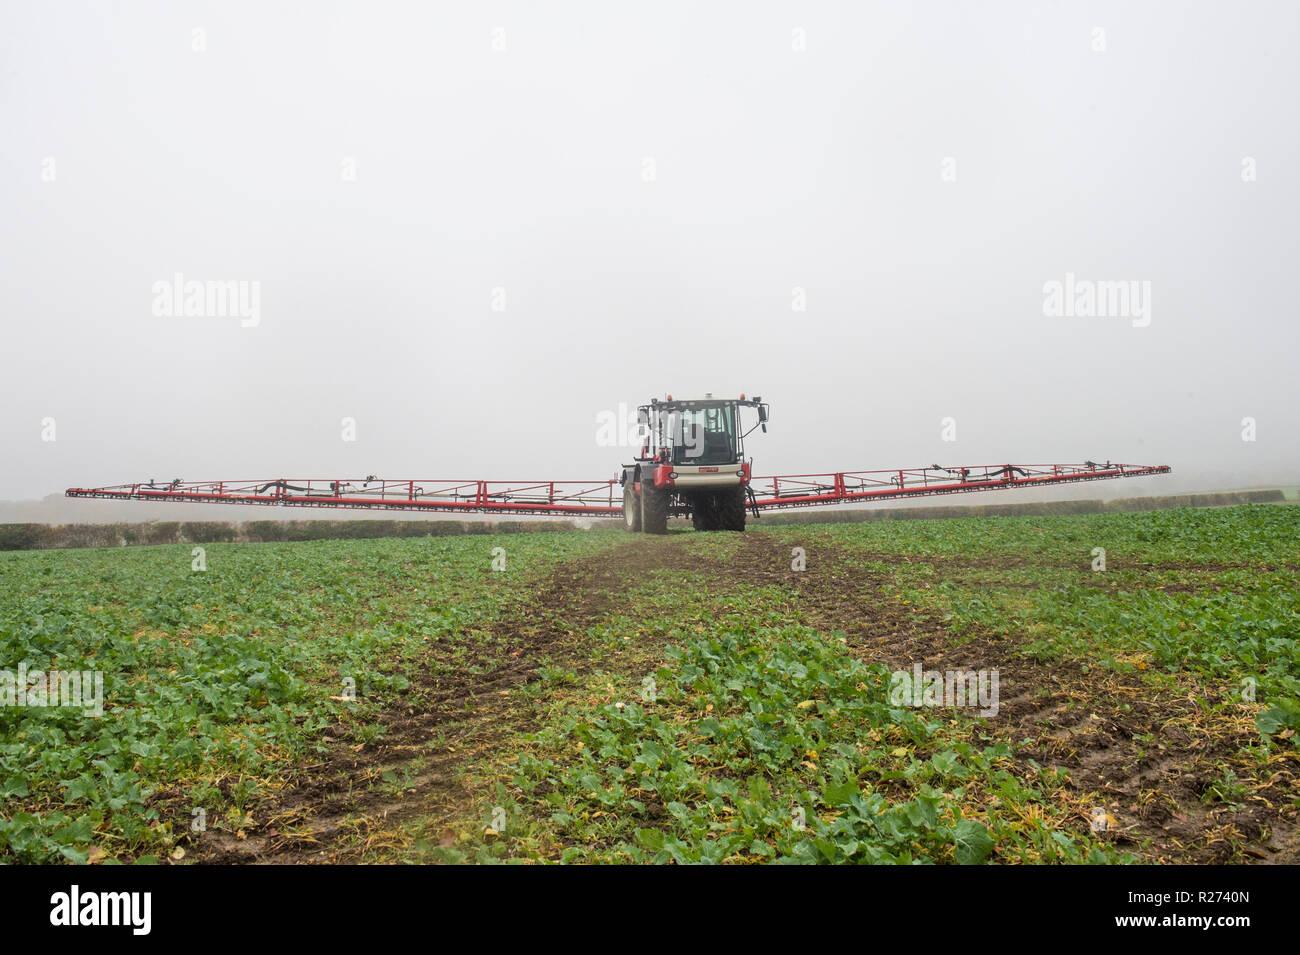 Agrifac crop sprayer - Stock Image